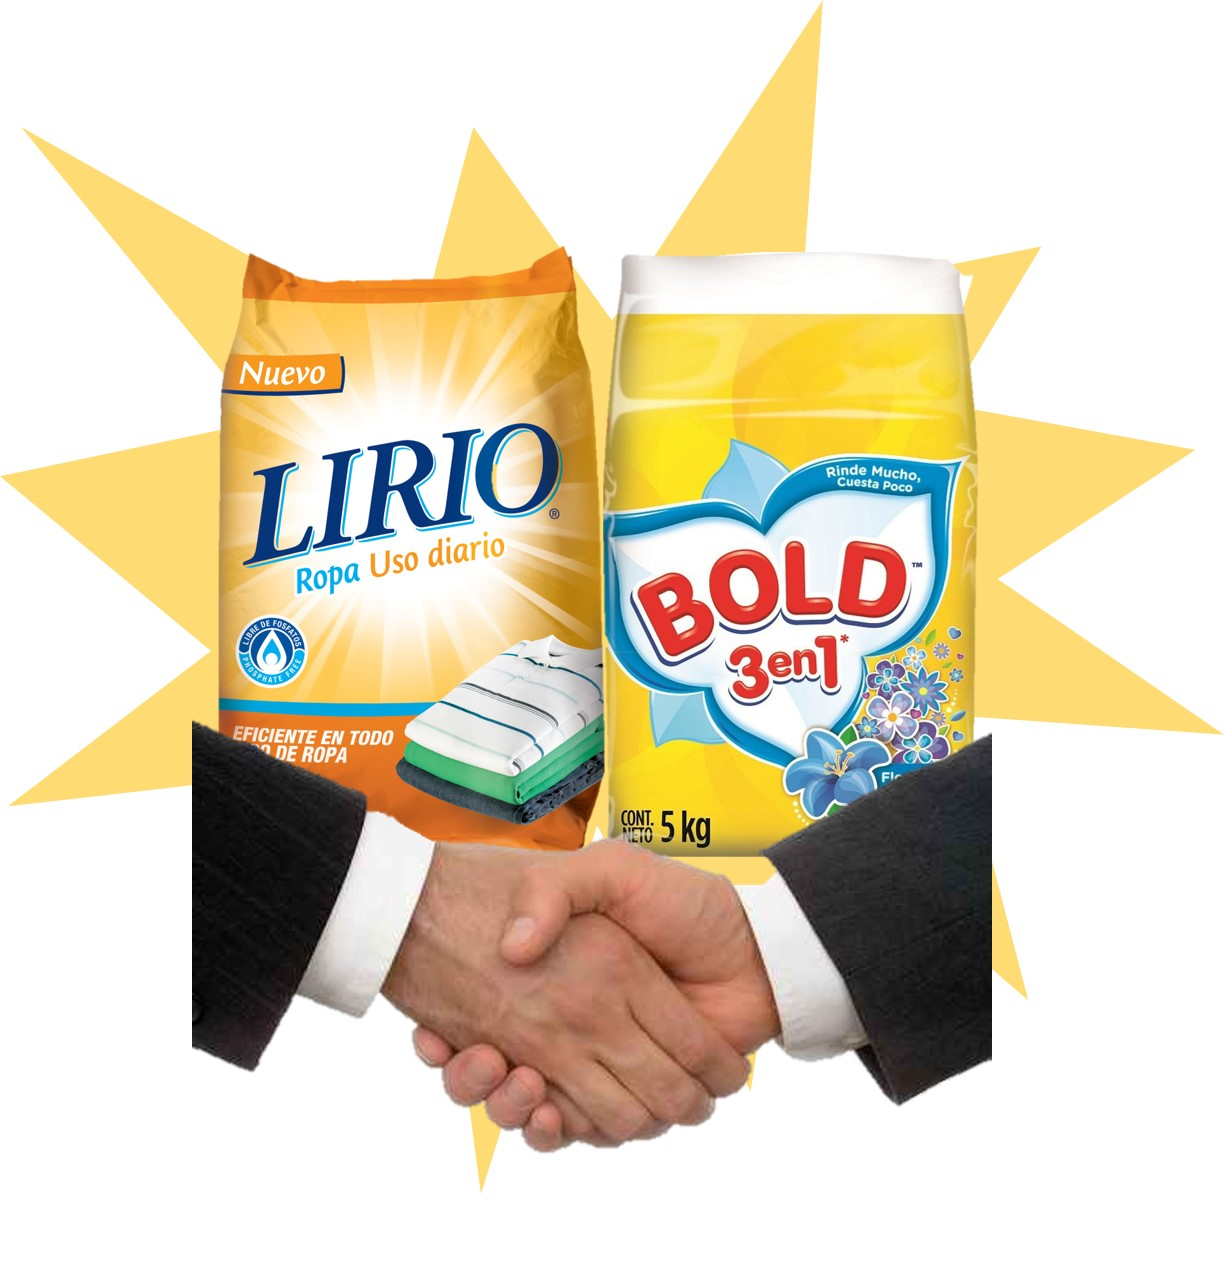 Lirio compra Bold